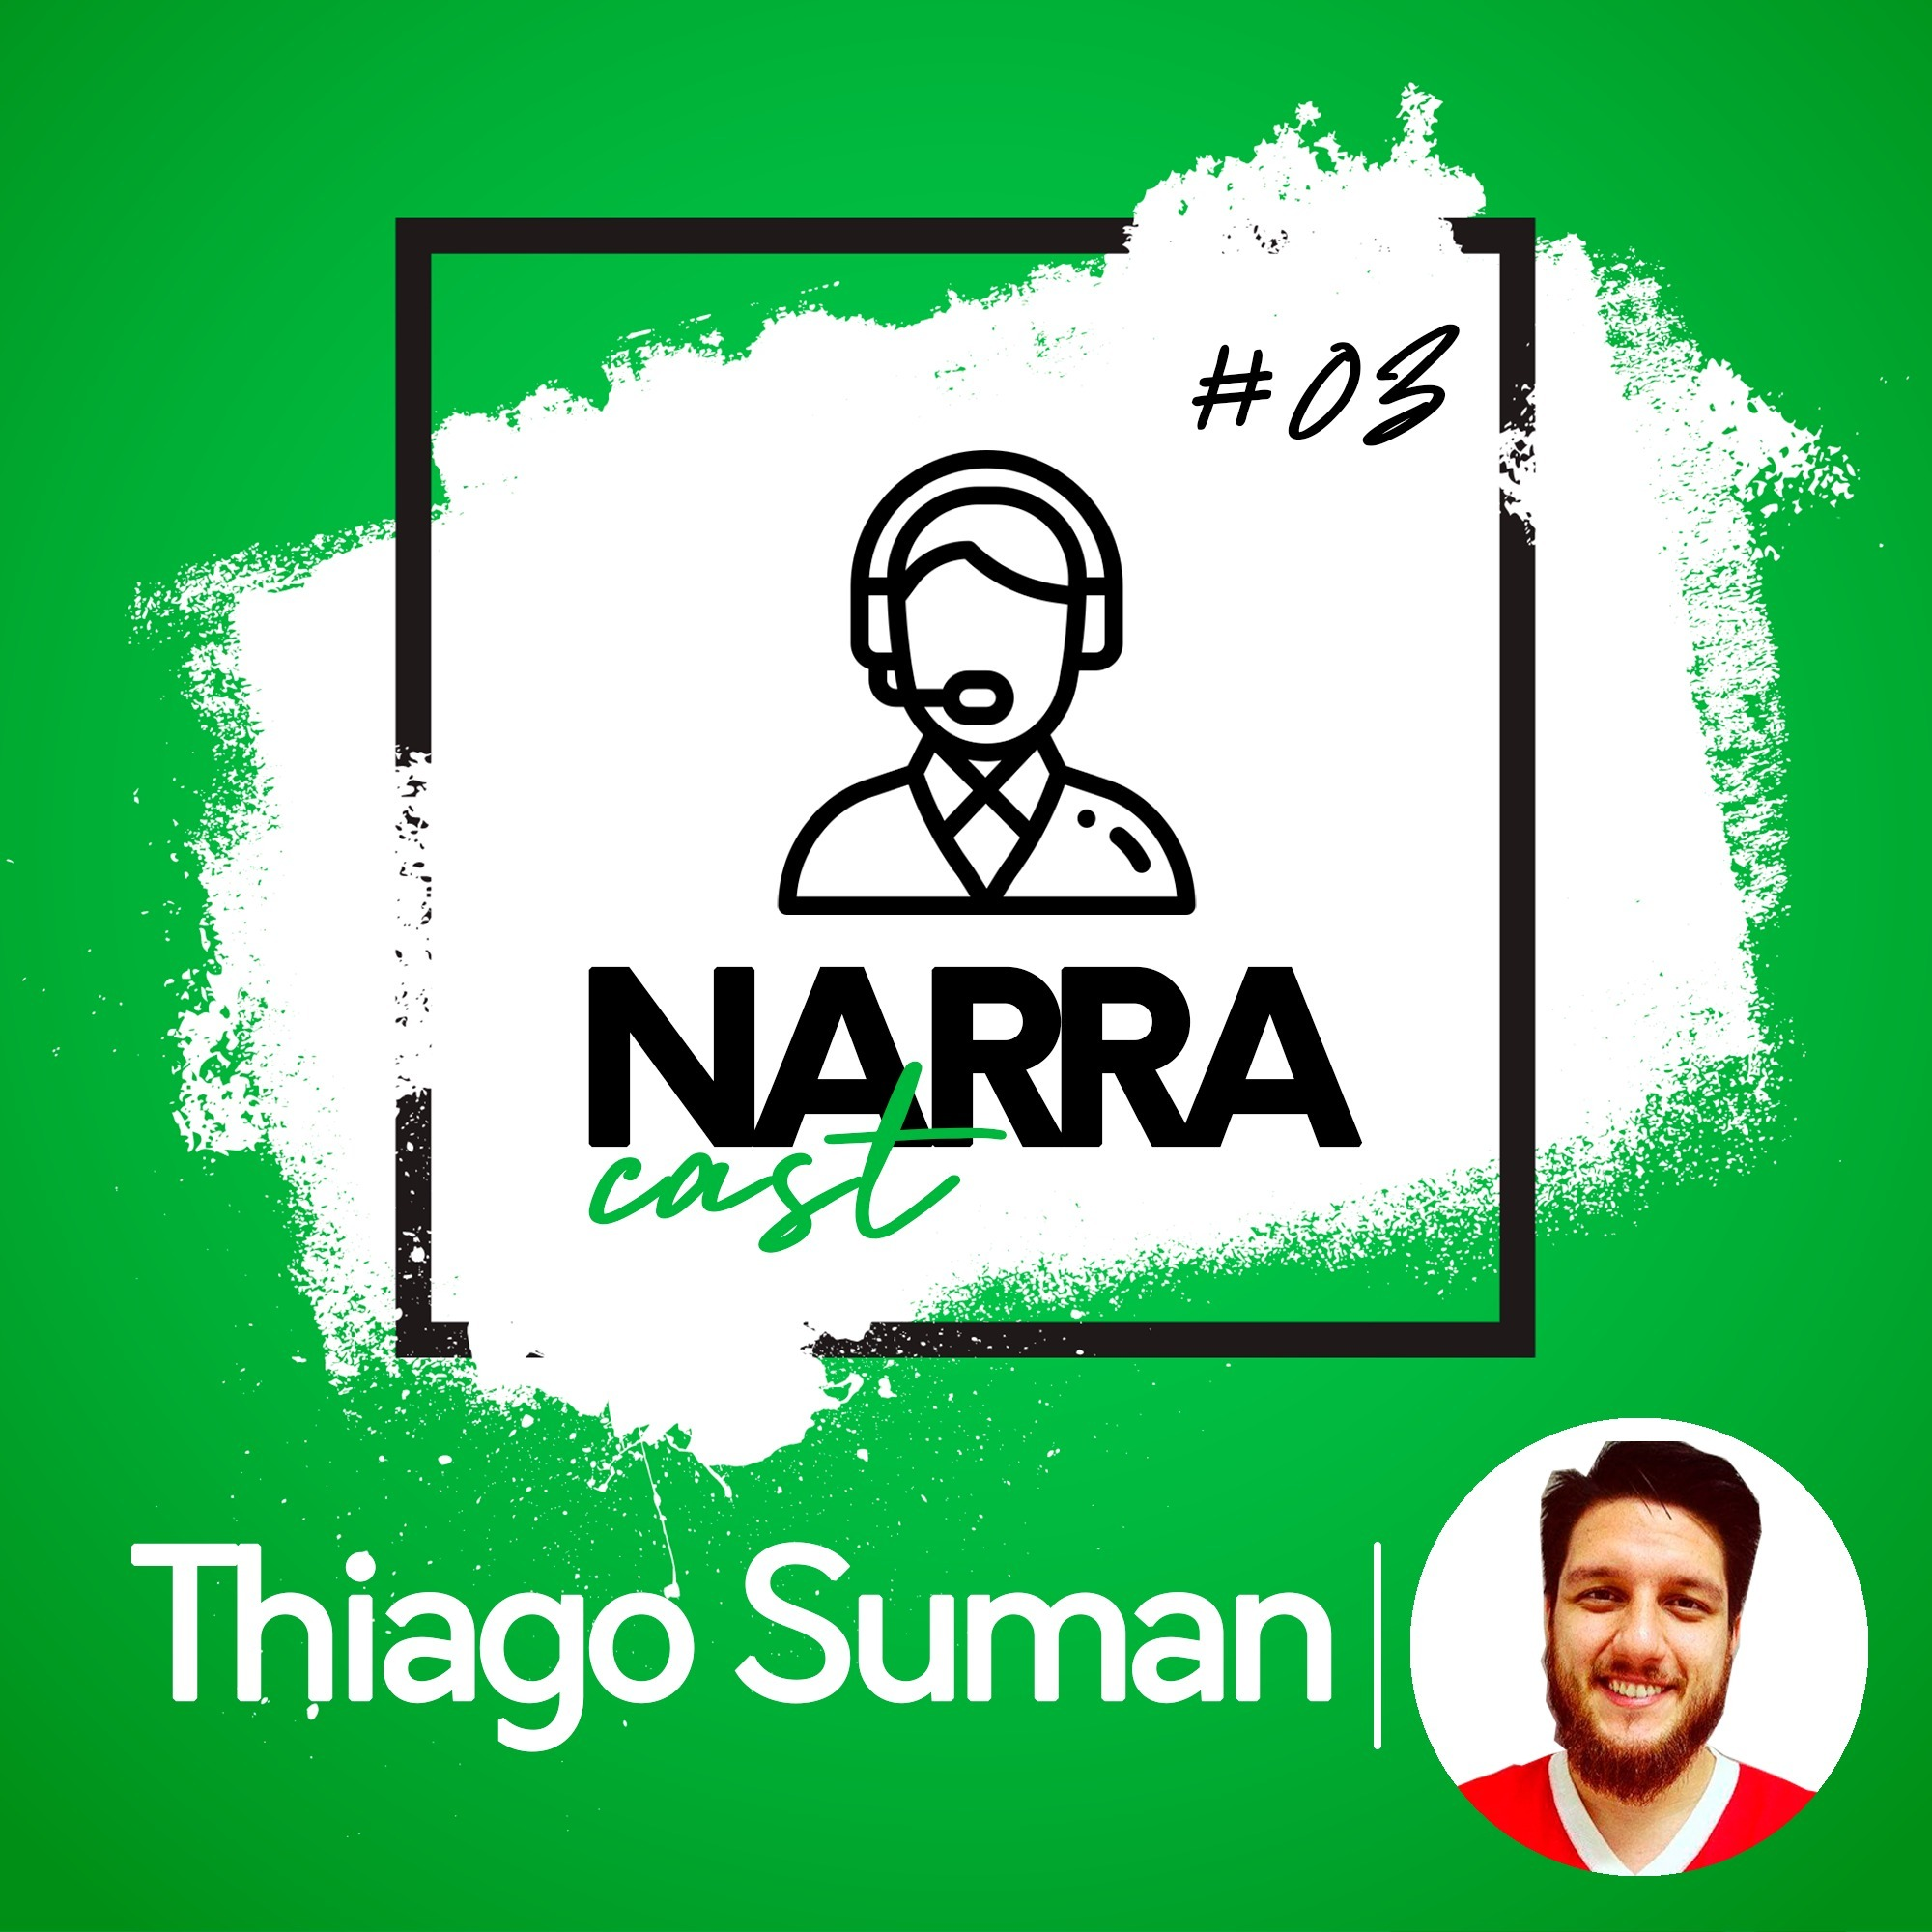 NarraCast #03 Thiago Suman